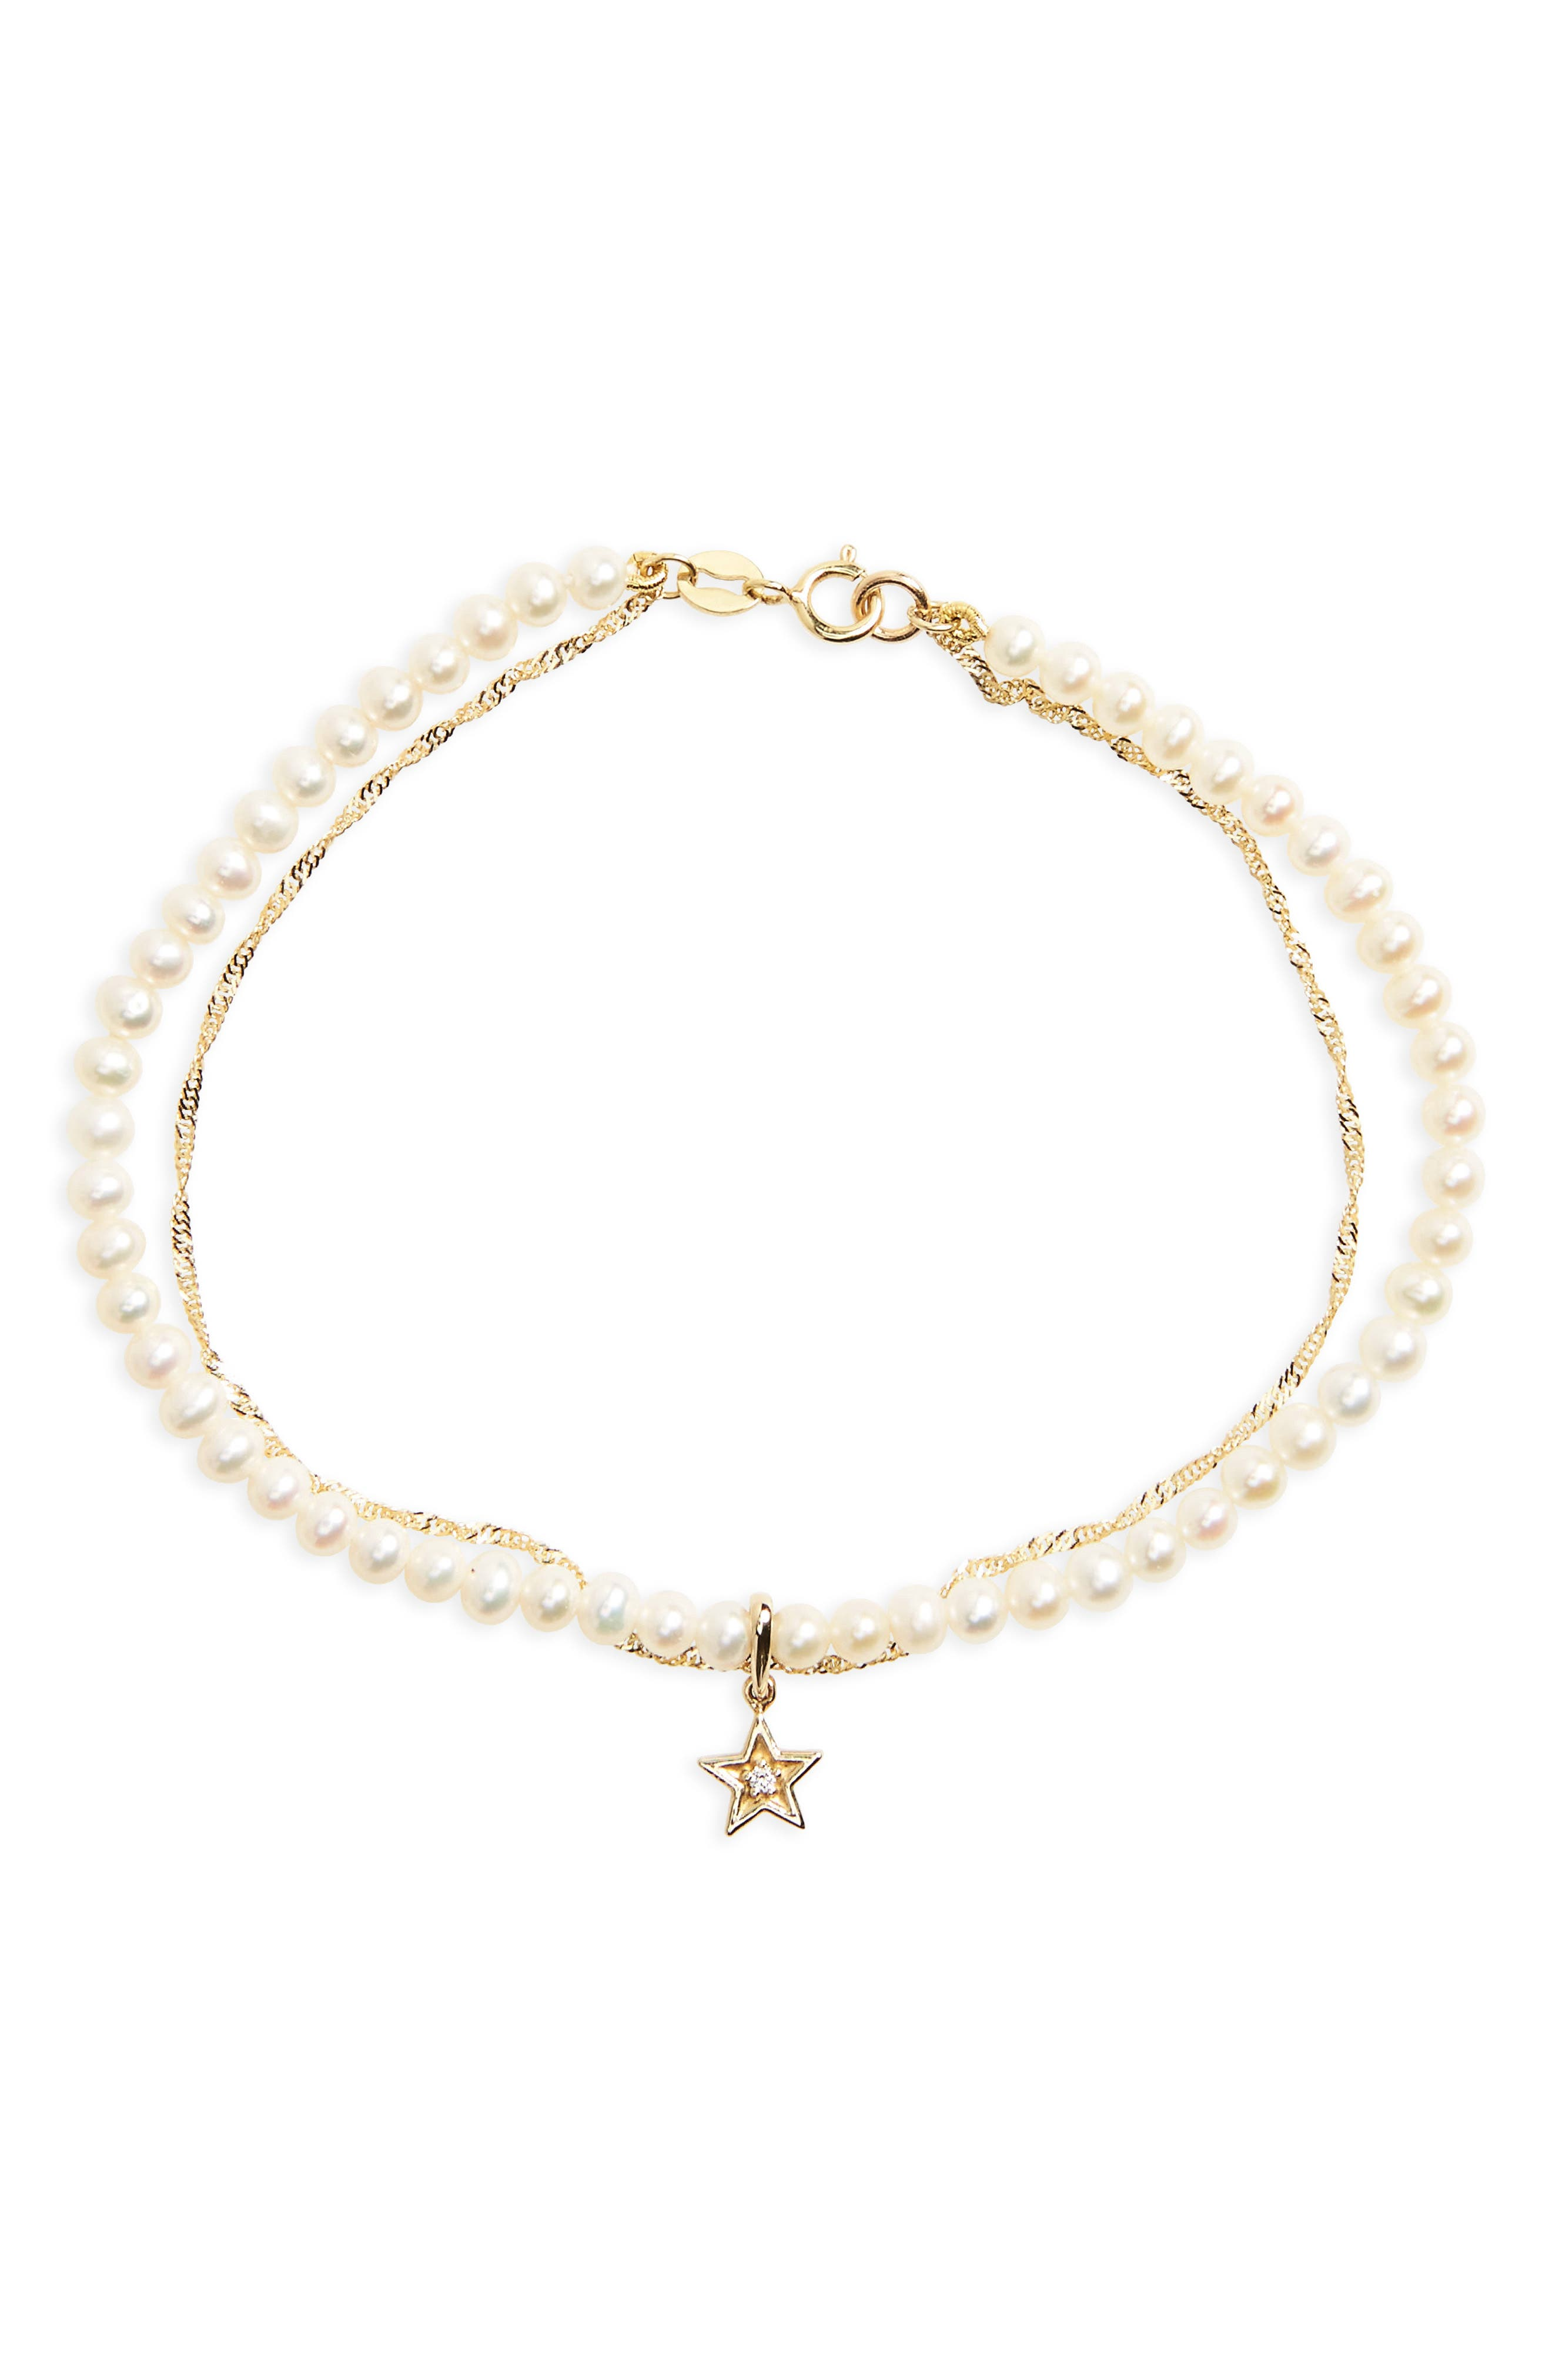 Pavé Diamond & Pearl Chain Bracelet,                         Main,                         color, YELLOW GOLD